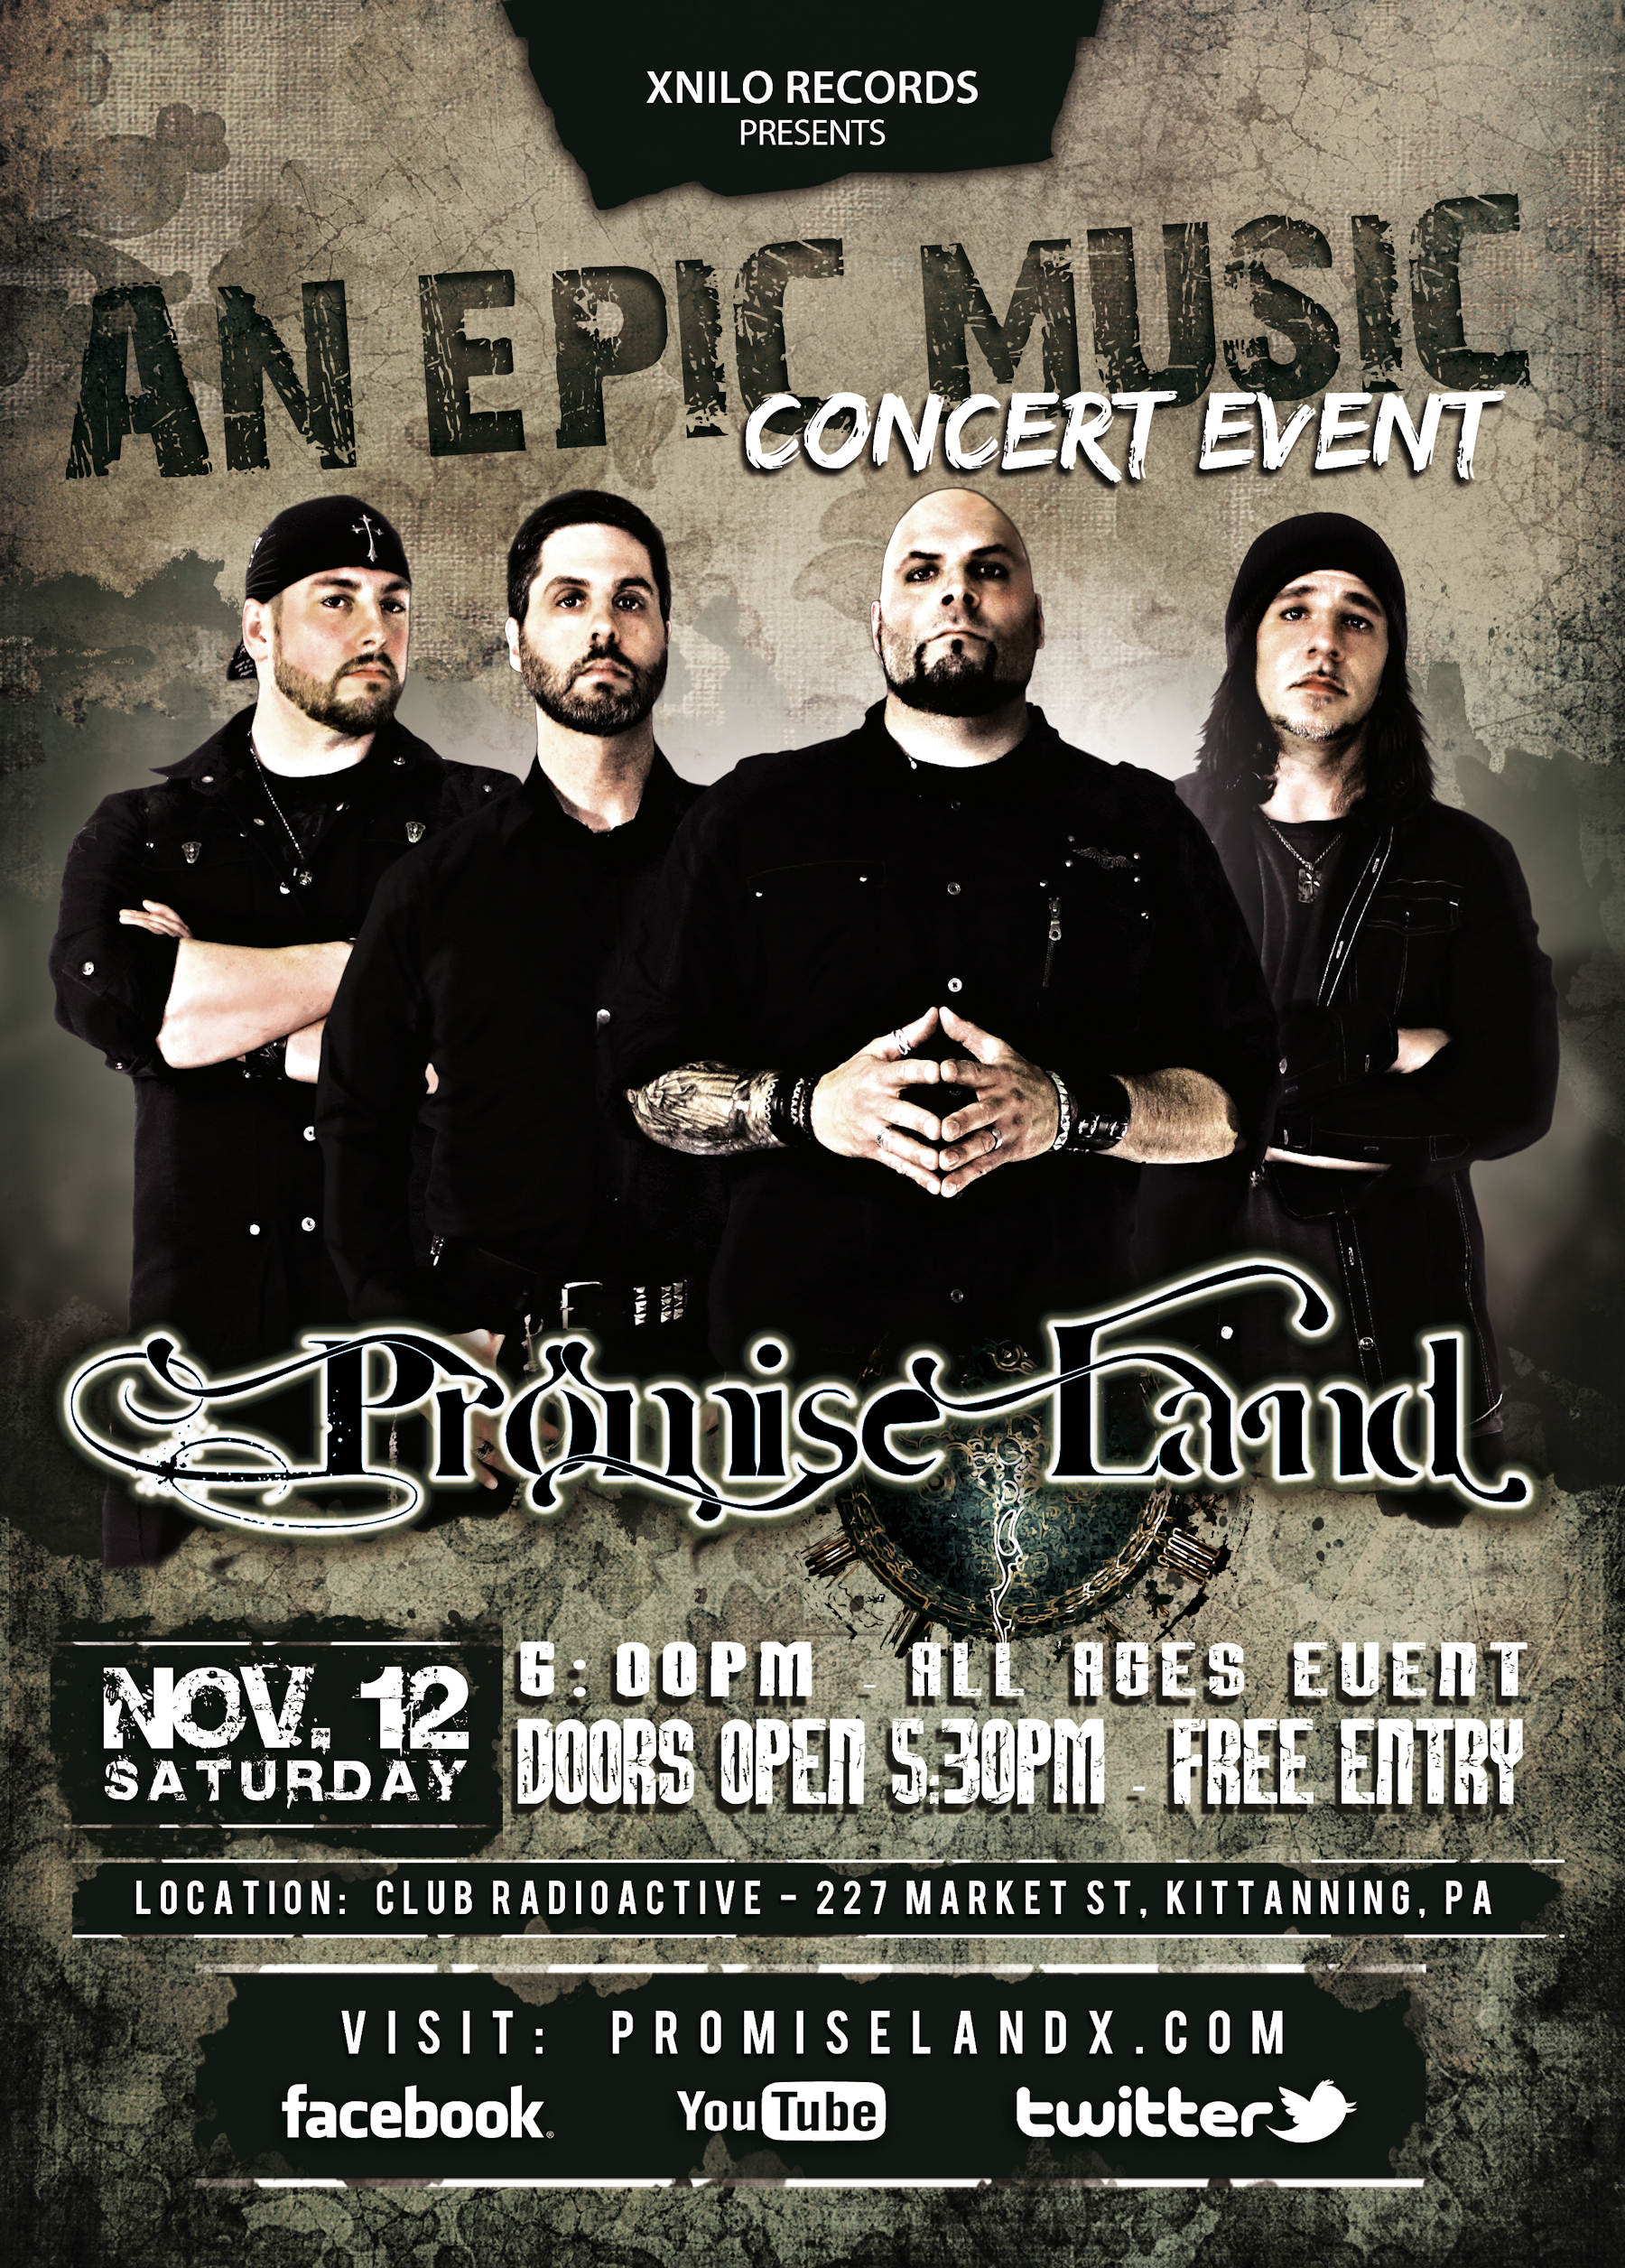 Promise Land - Live at Club Radioactive - November 12 2016